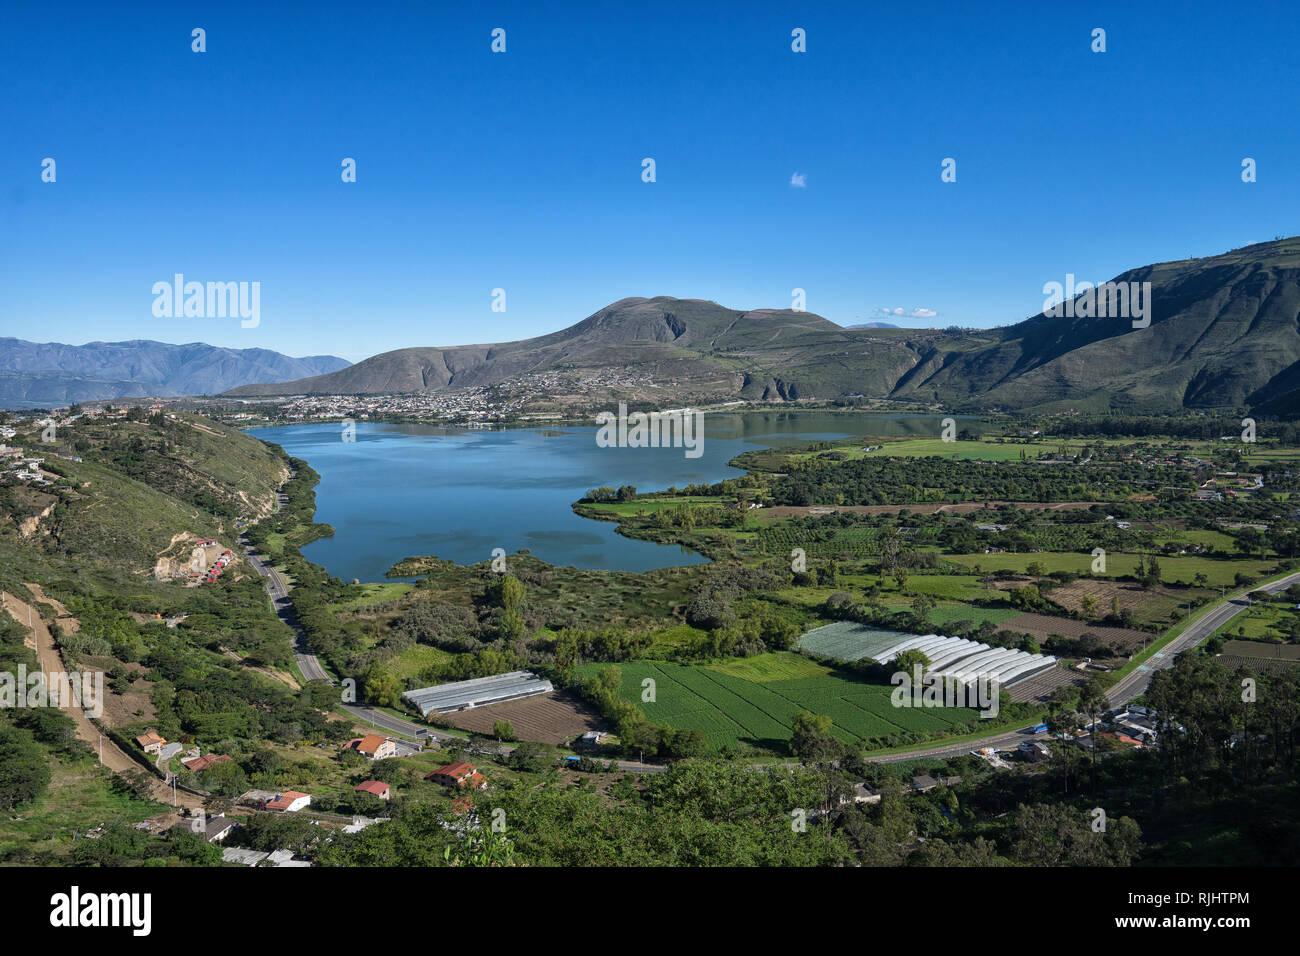 the Yahuarcocha Lake seen from above in Ibarra Ecuador - Stock Image